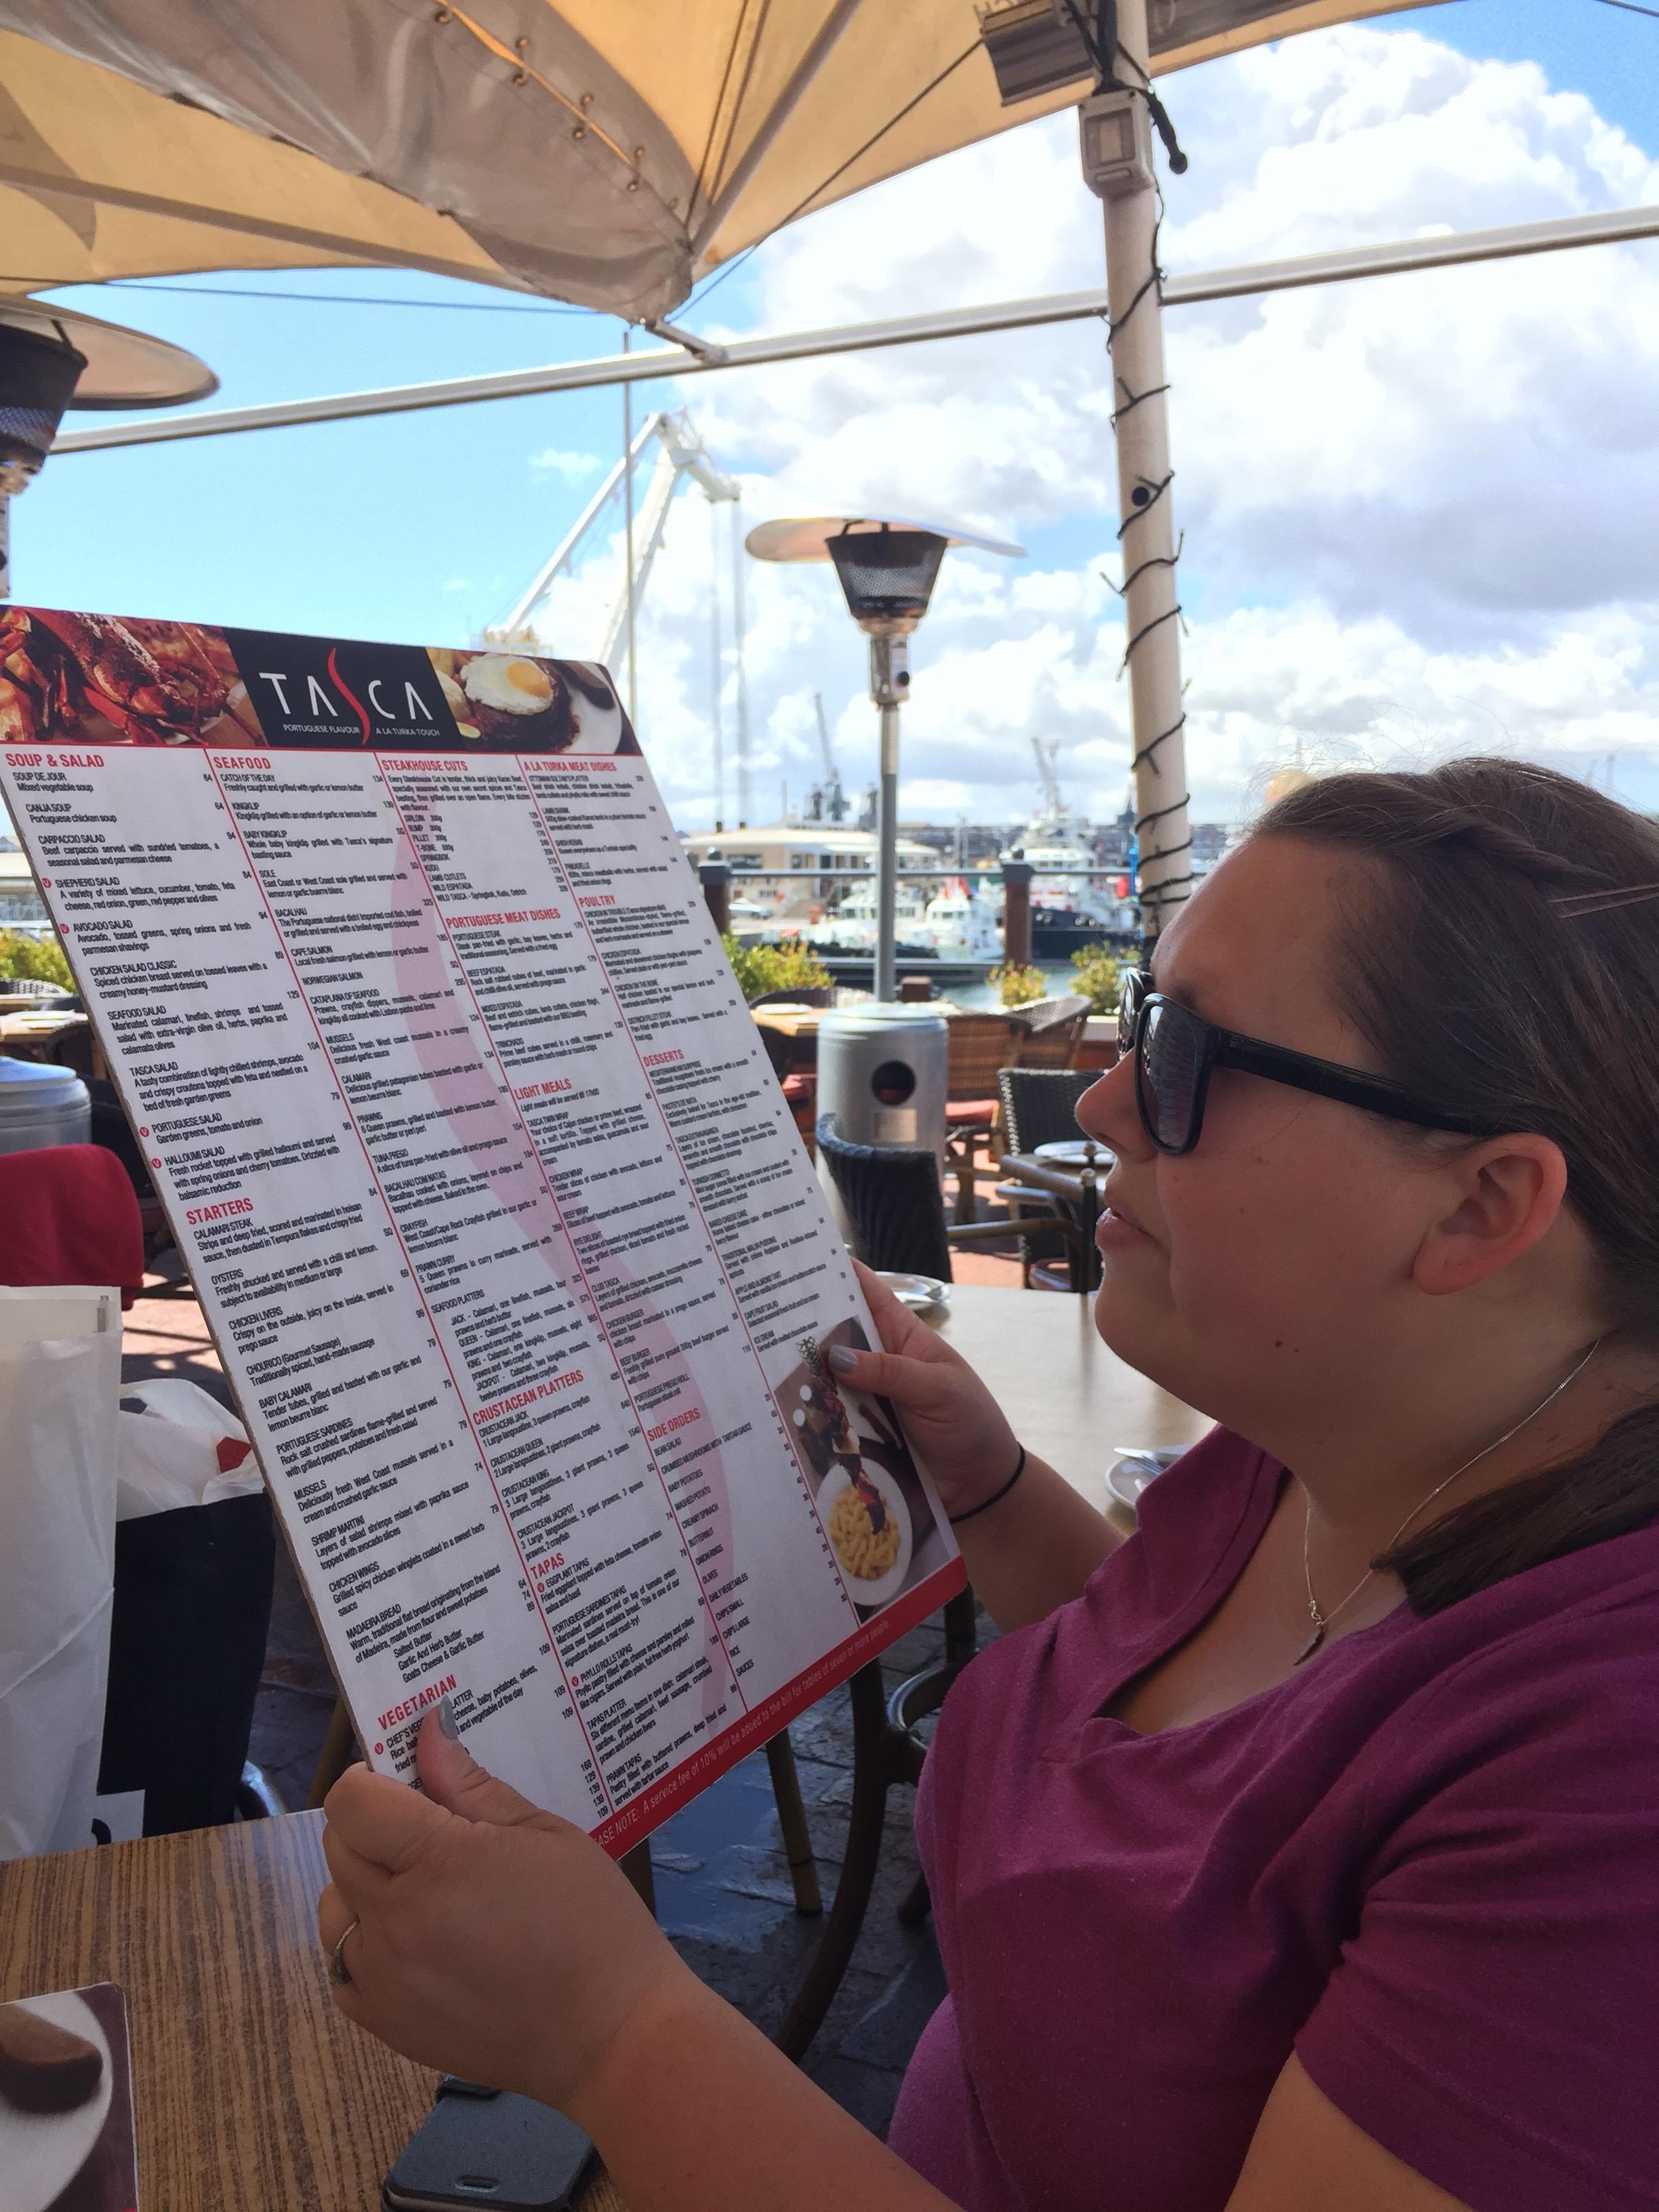 The menu was huge, like 2 feet tall huge.